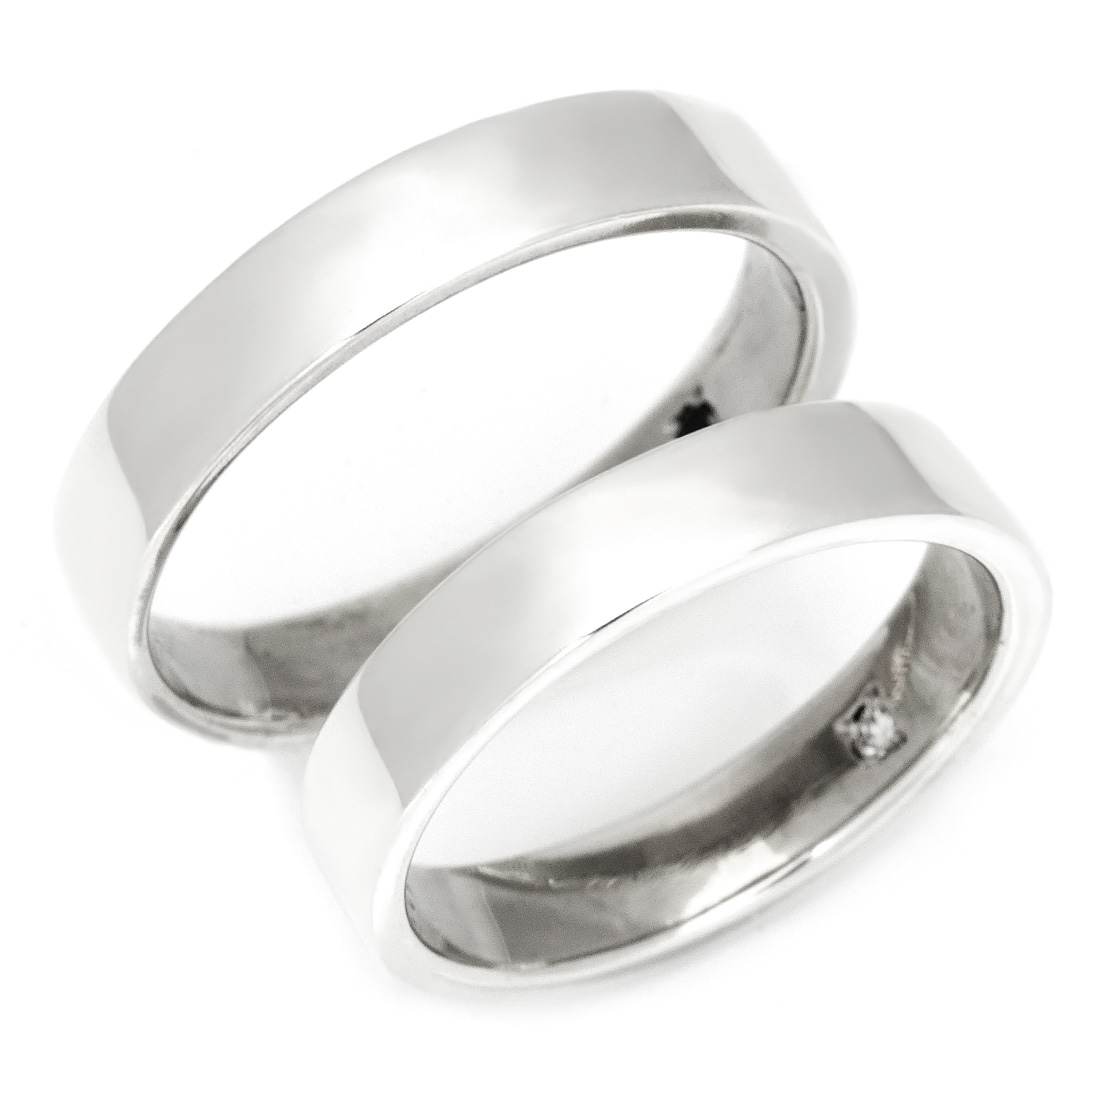 【GWクーポン配布中】マリッジリング ダイヤモンド 「Plate」 プラチナ900 (レディース:1~20号 メンズ:10~29号)